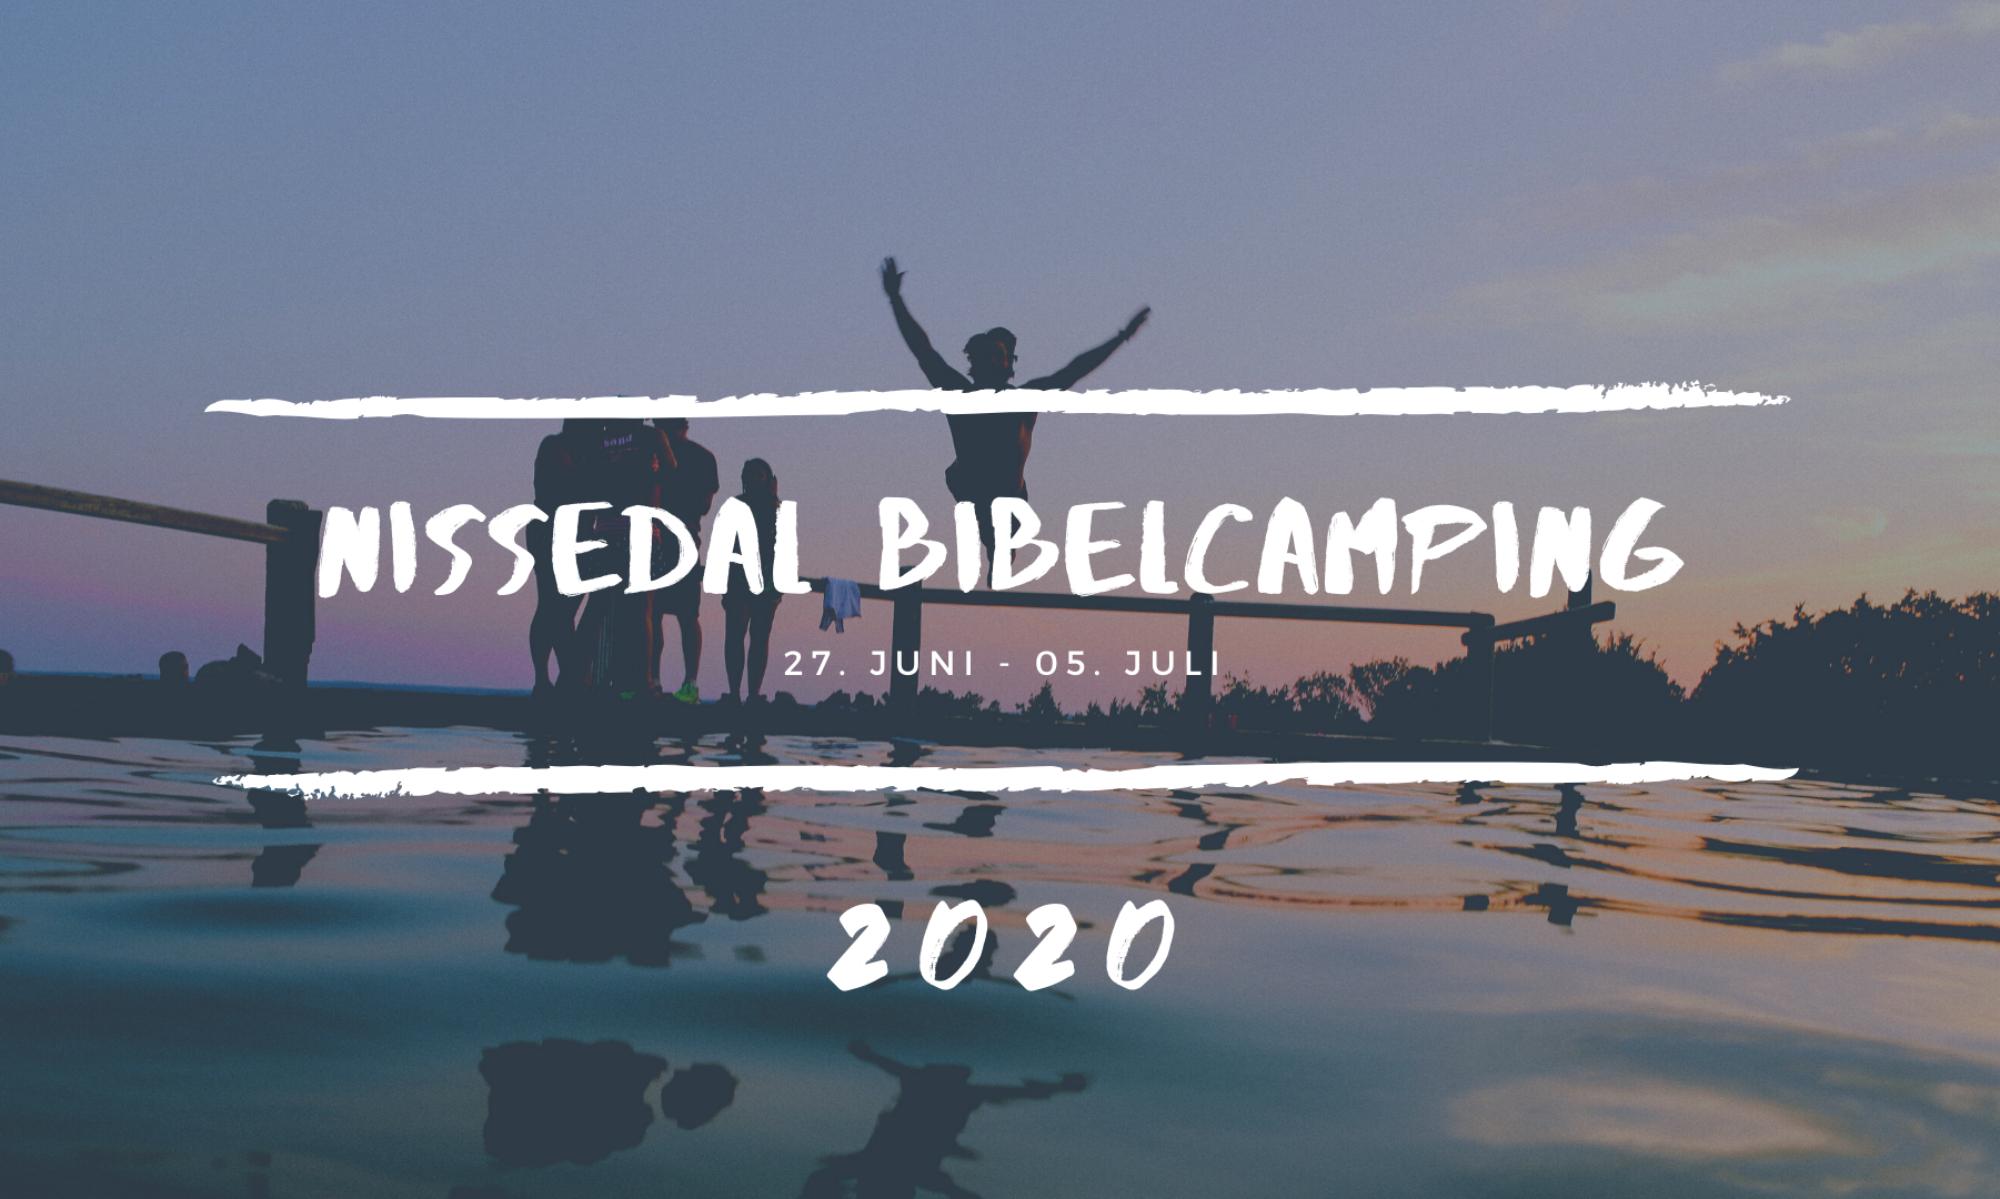 Nissedal Bibelcamping 2019